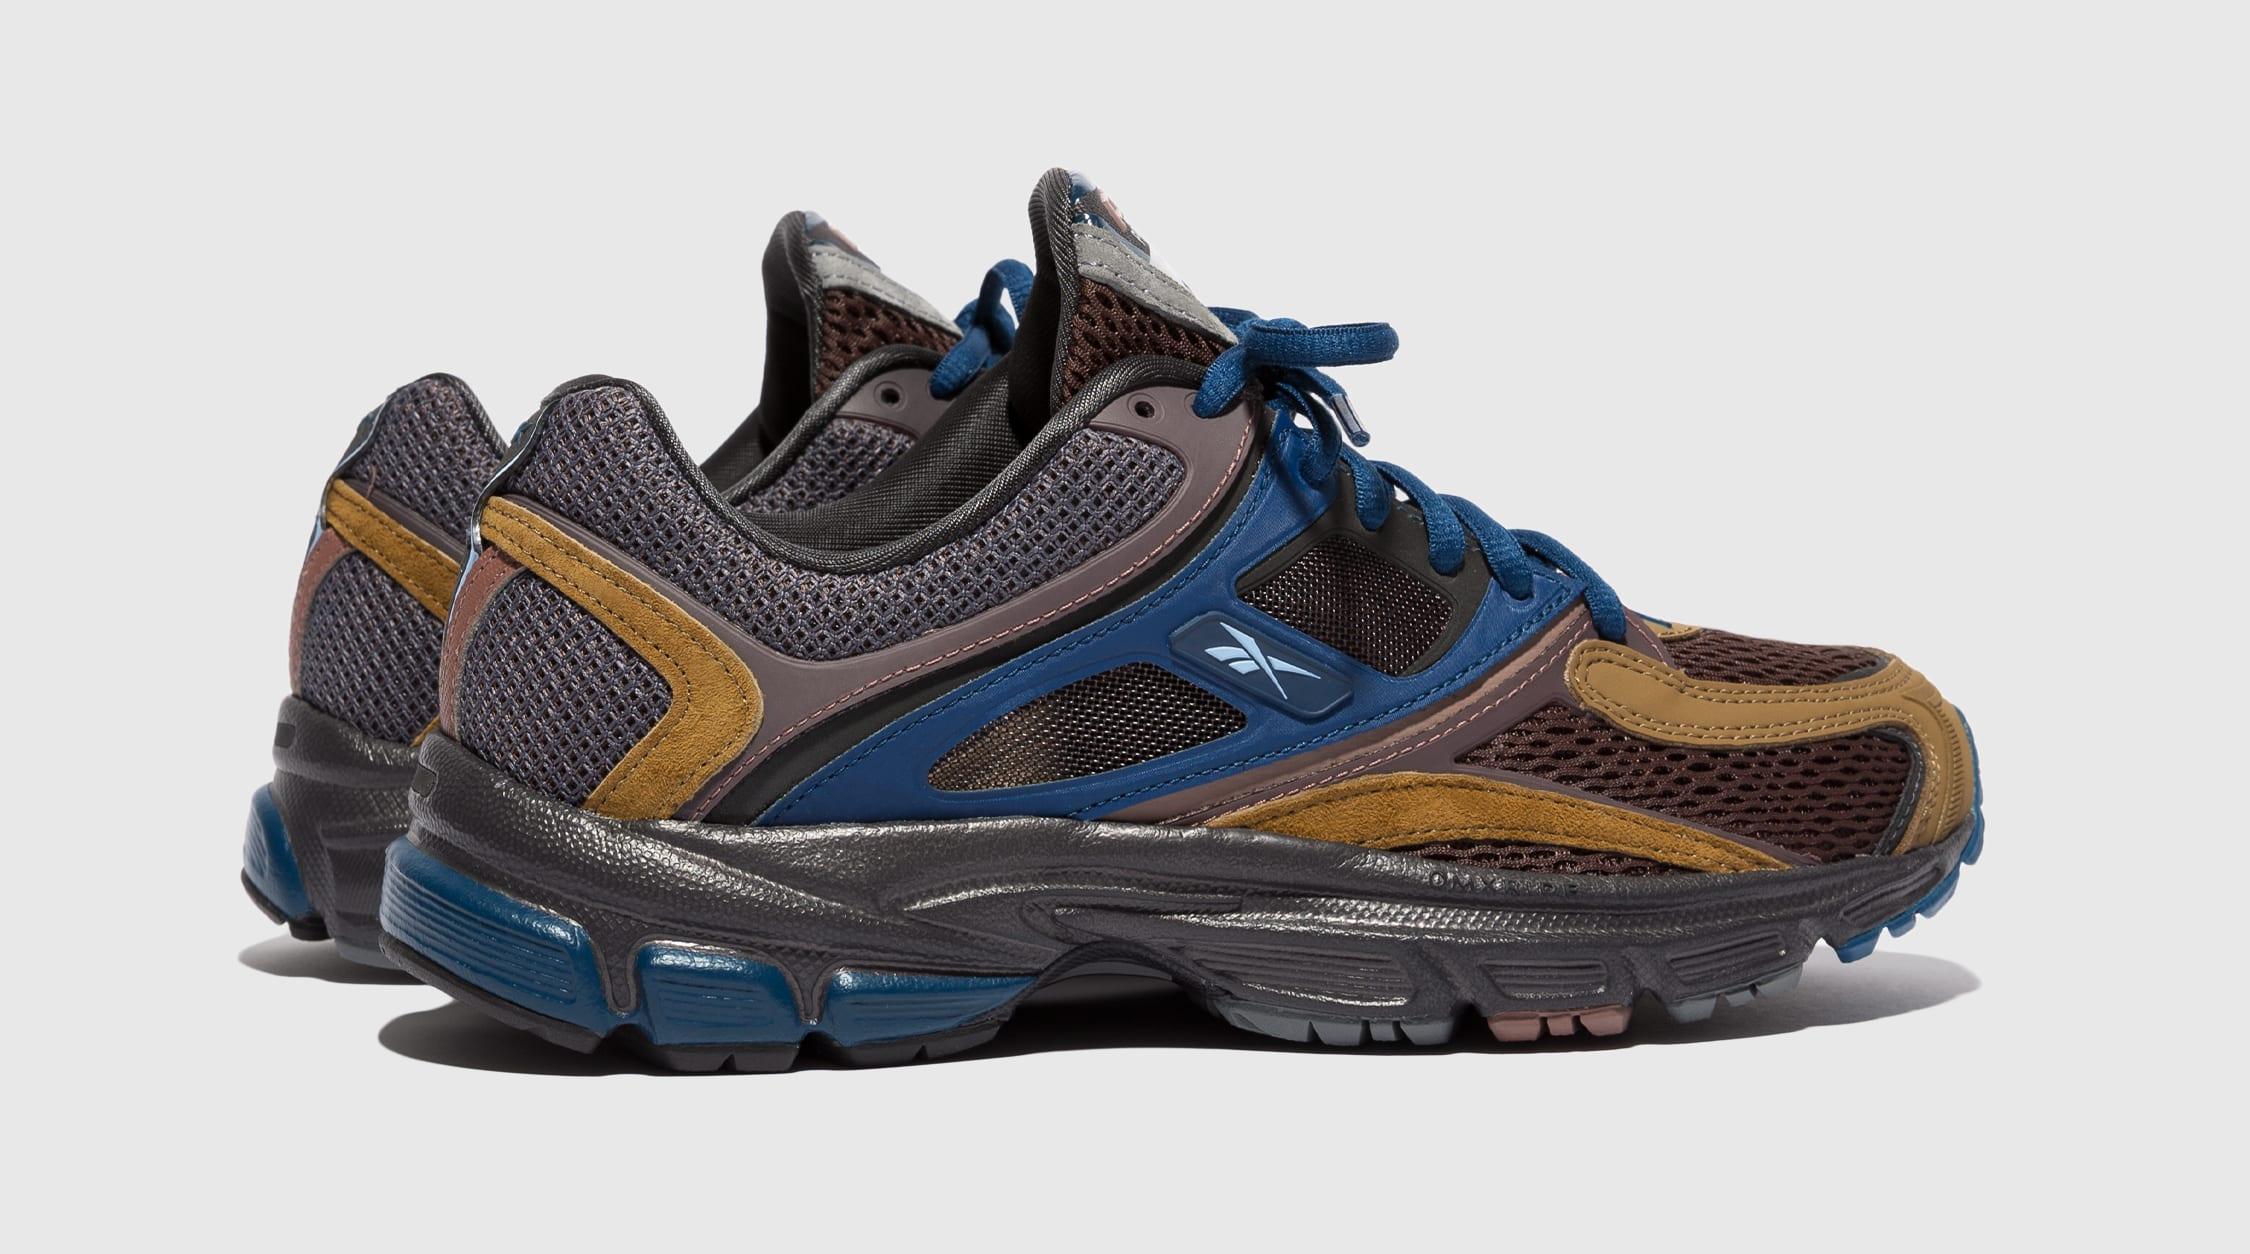 Packer Shoes x Reebok Trinity Premier Brown FY3408 Side